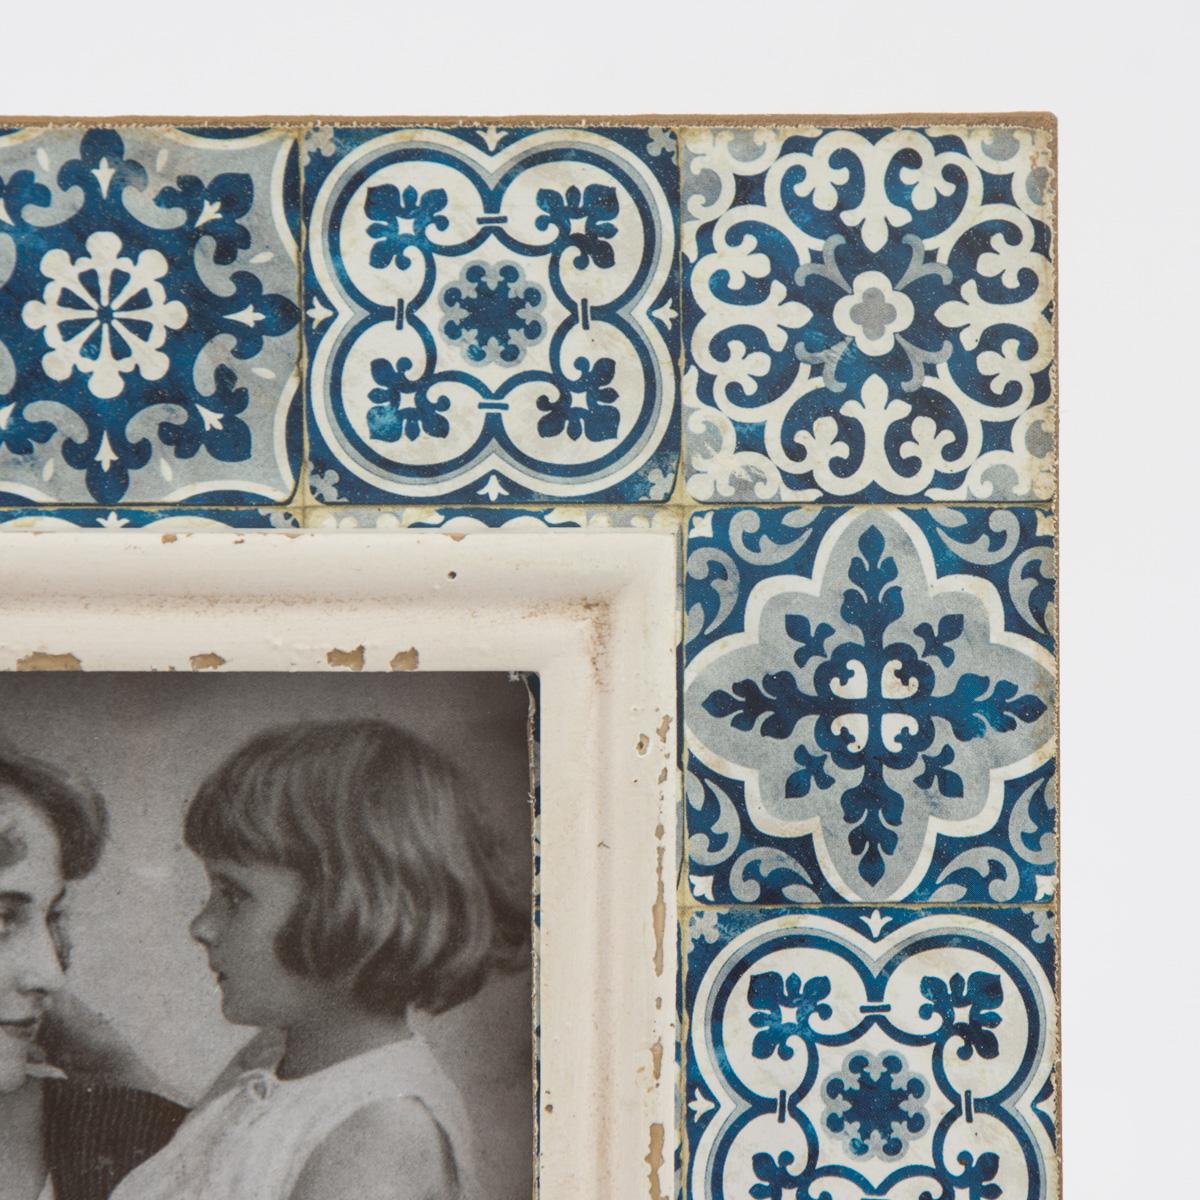 bilderrahmen holz ornament blau vintage 20x25cm wohnen wohnaccessoires bilderrahmen. Black Bedroom Furniture Sets. Home Design Ideas